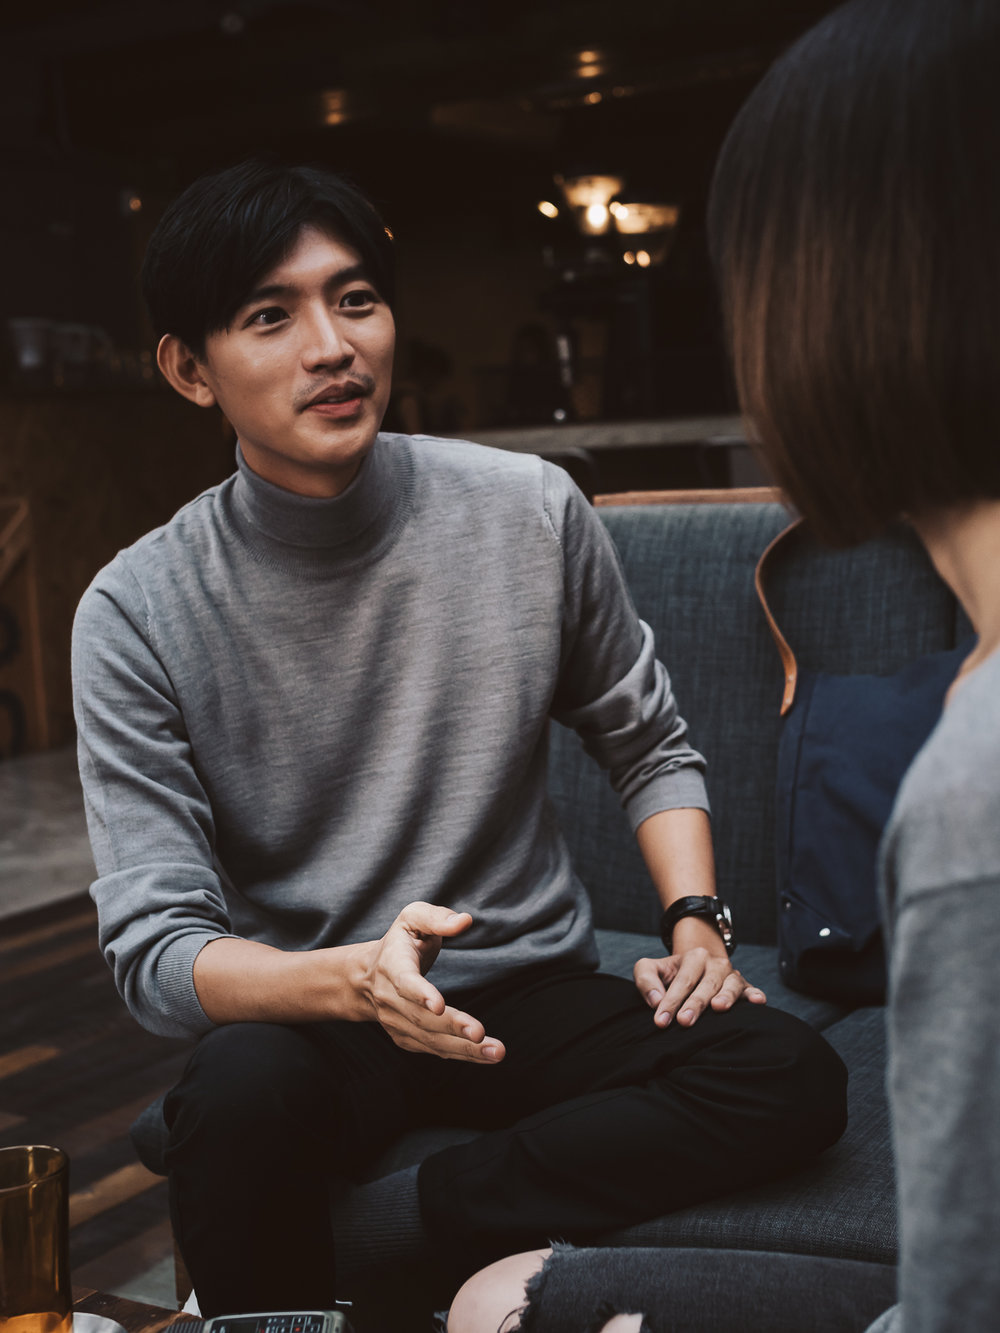 Figaro Tseng 曾少宗 Interview Taipei Taiwan - Olympus EM1Markii2512 - Yes! Please Enjoy by Fanning Tseng-38.jpg